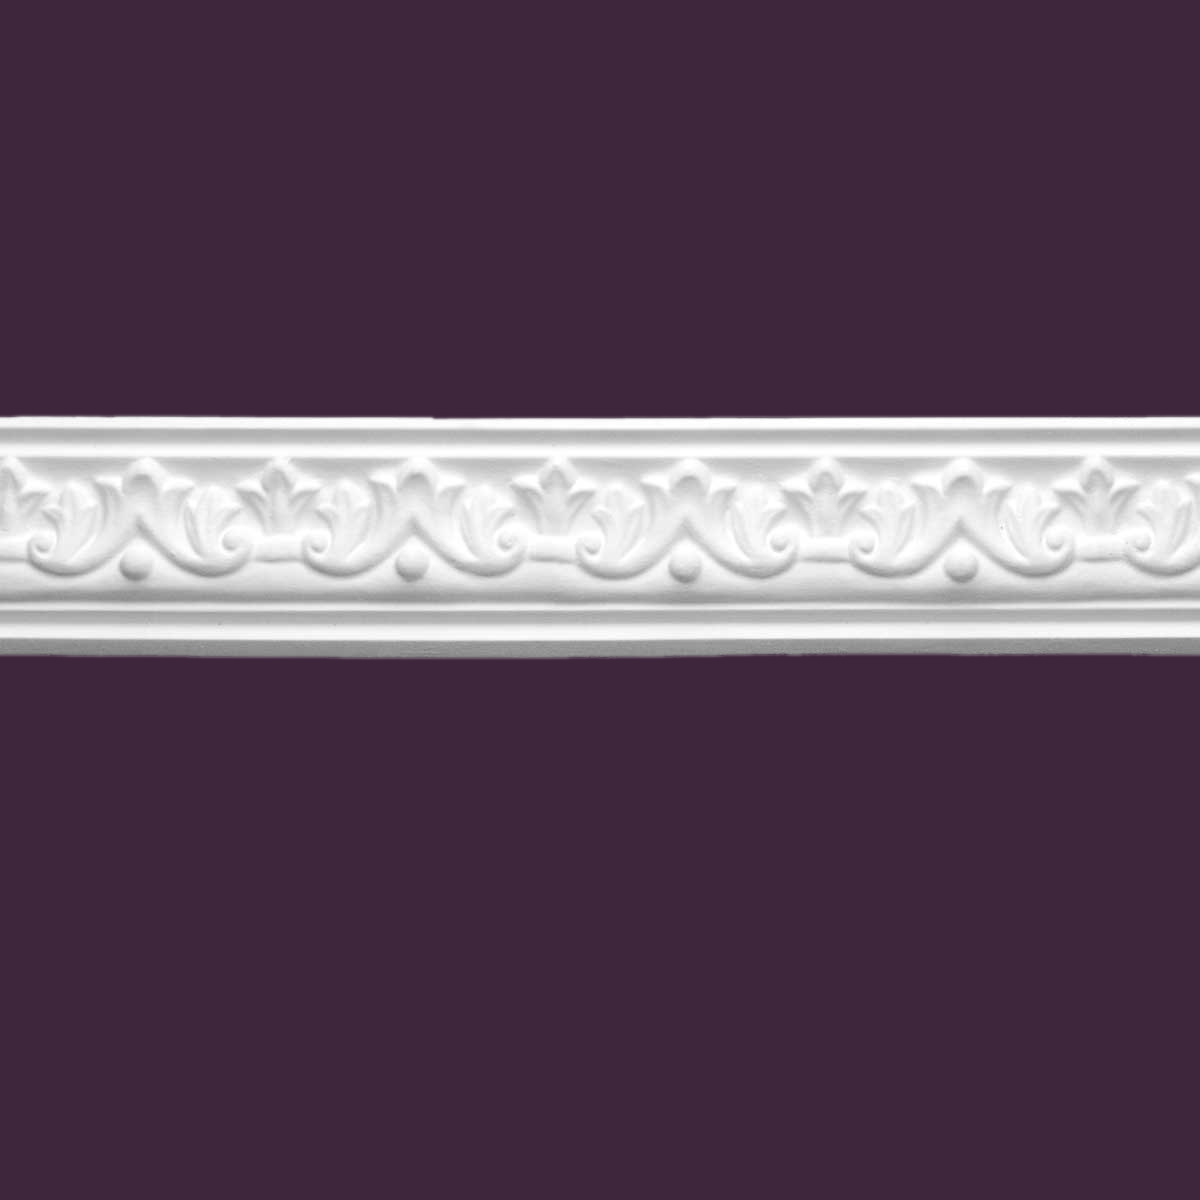 Cornice White Urethane Sample of 12409 24 Cornice Cornice Moulding Cornice Molding